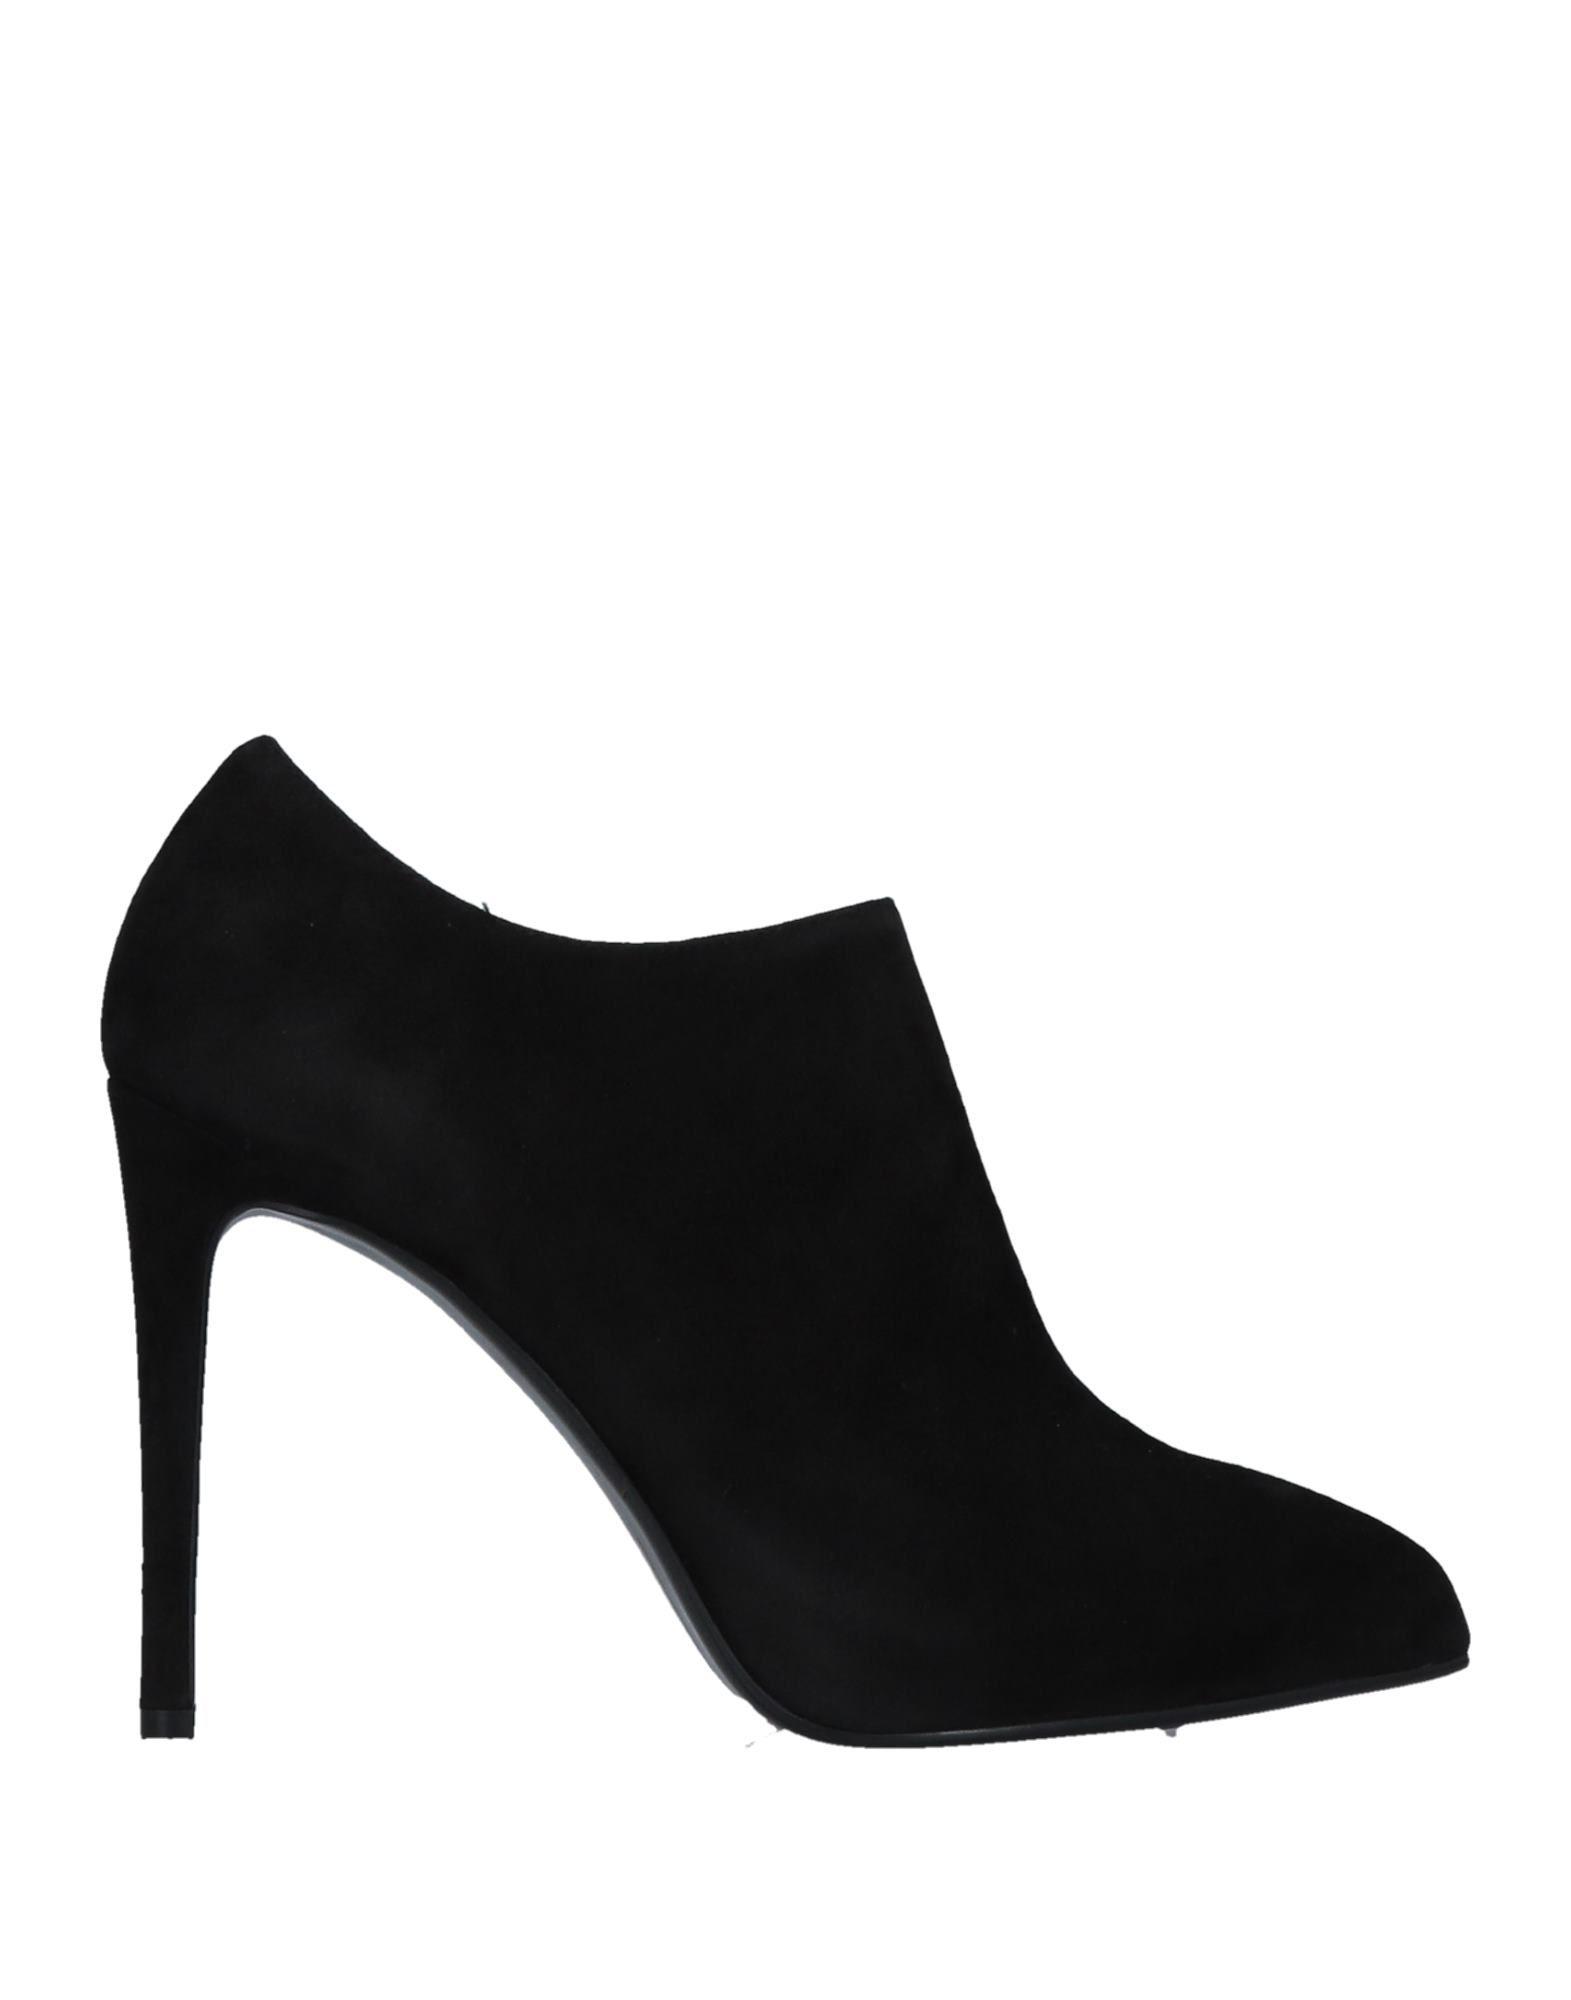 Lola Cruz Stiefelette Damen  11264536UQ Neue Schuhe